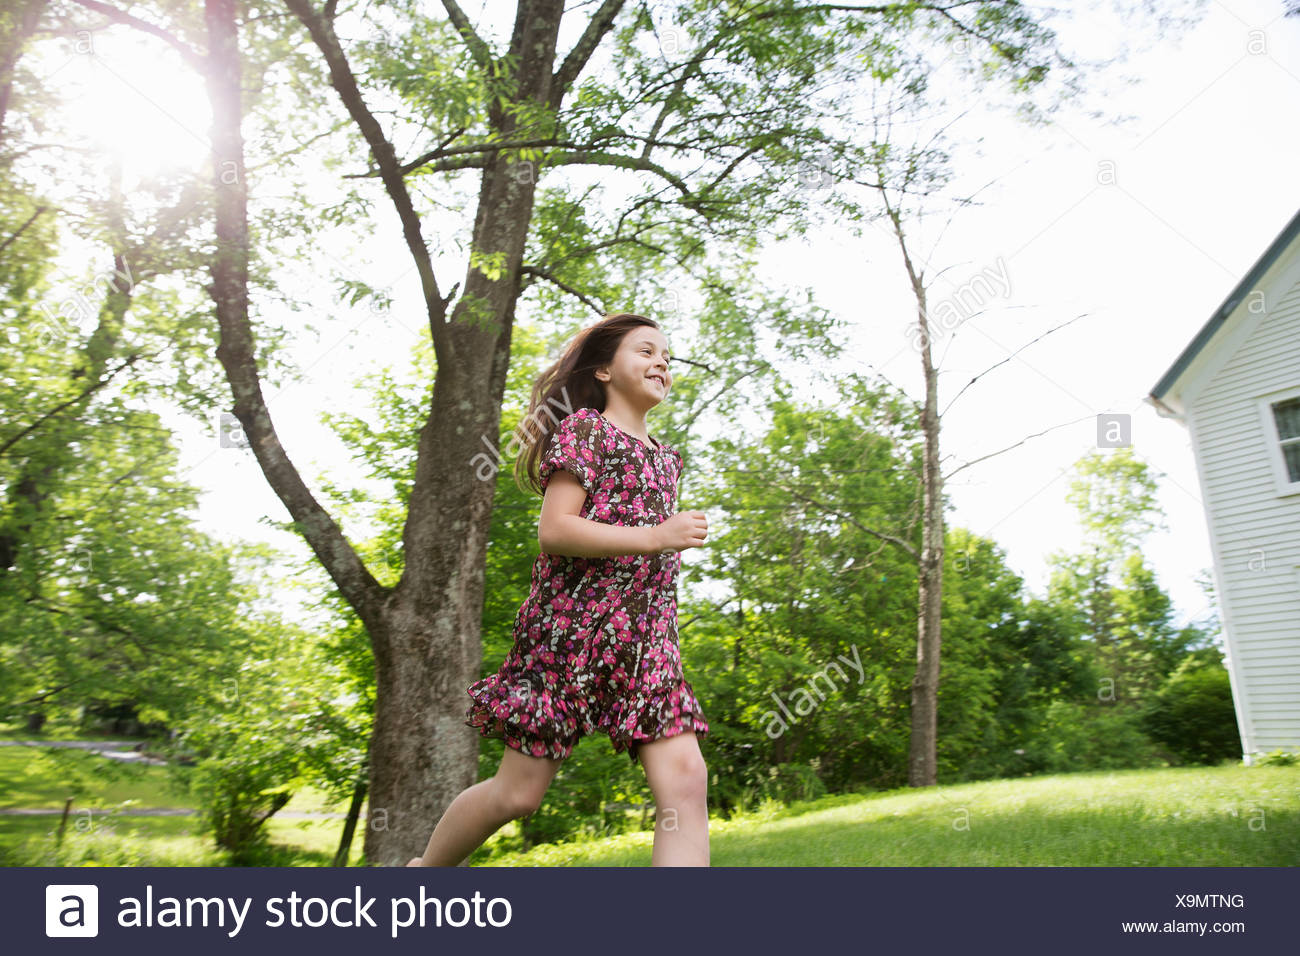 boy running across grass stockfotos boy running across grass bilder alamy. Black Bedroom Furniture Sets. Home Design Ideas